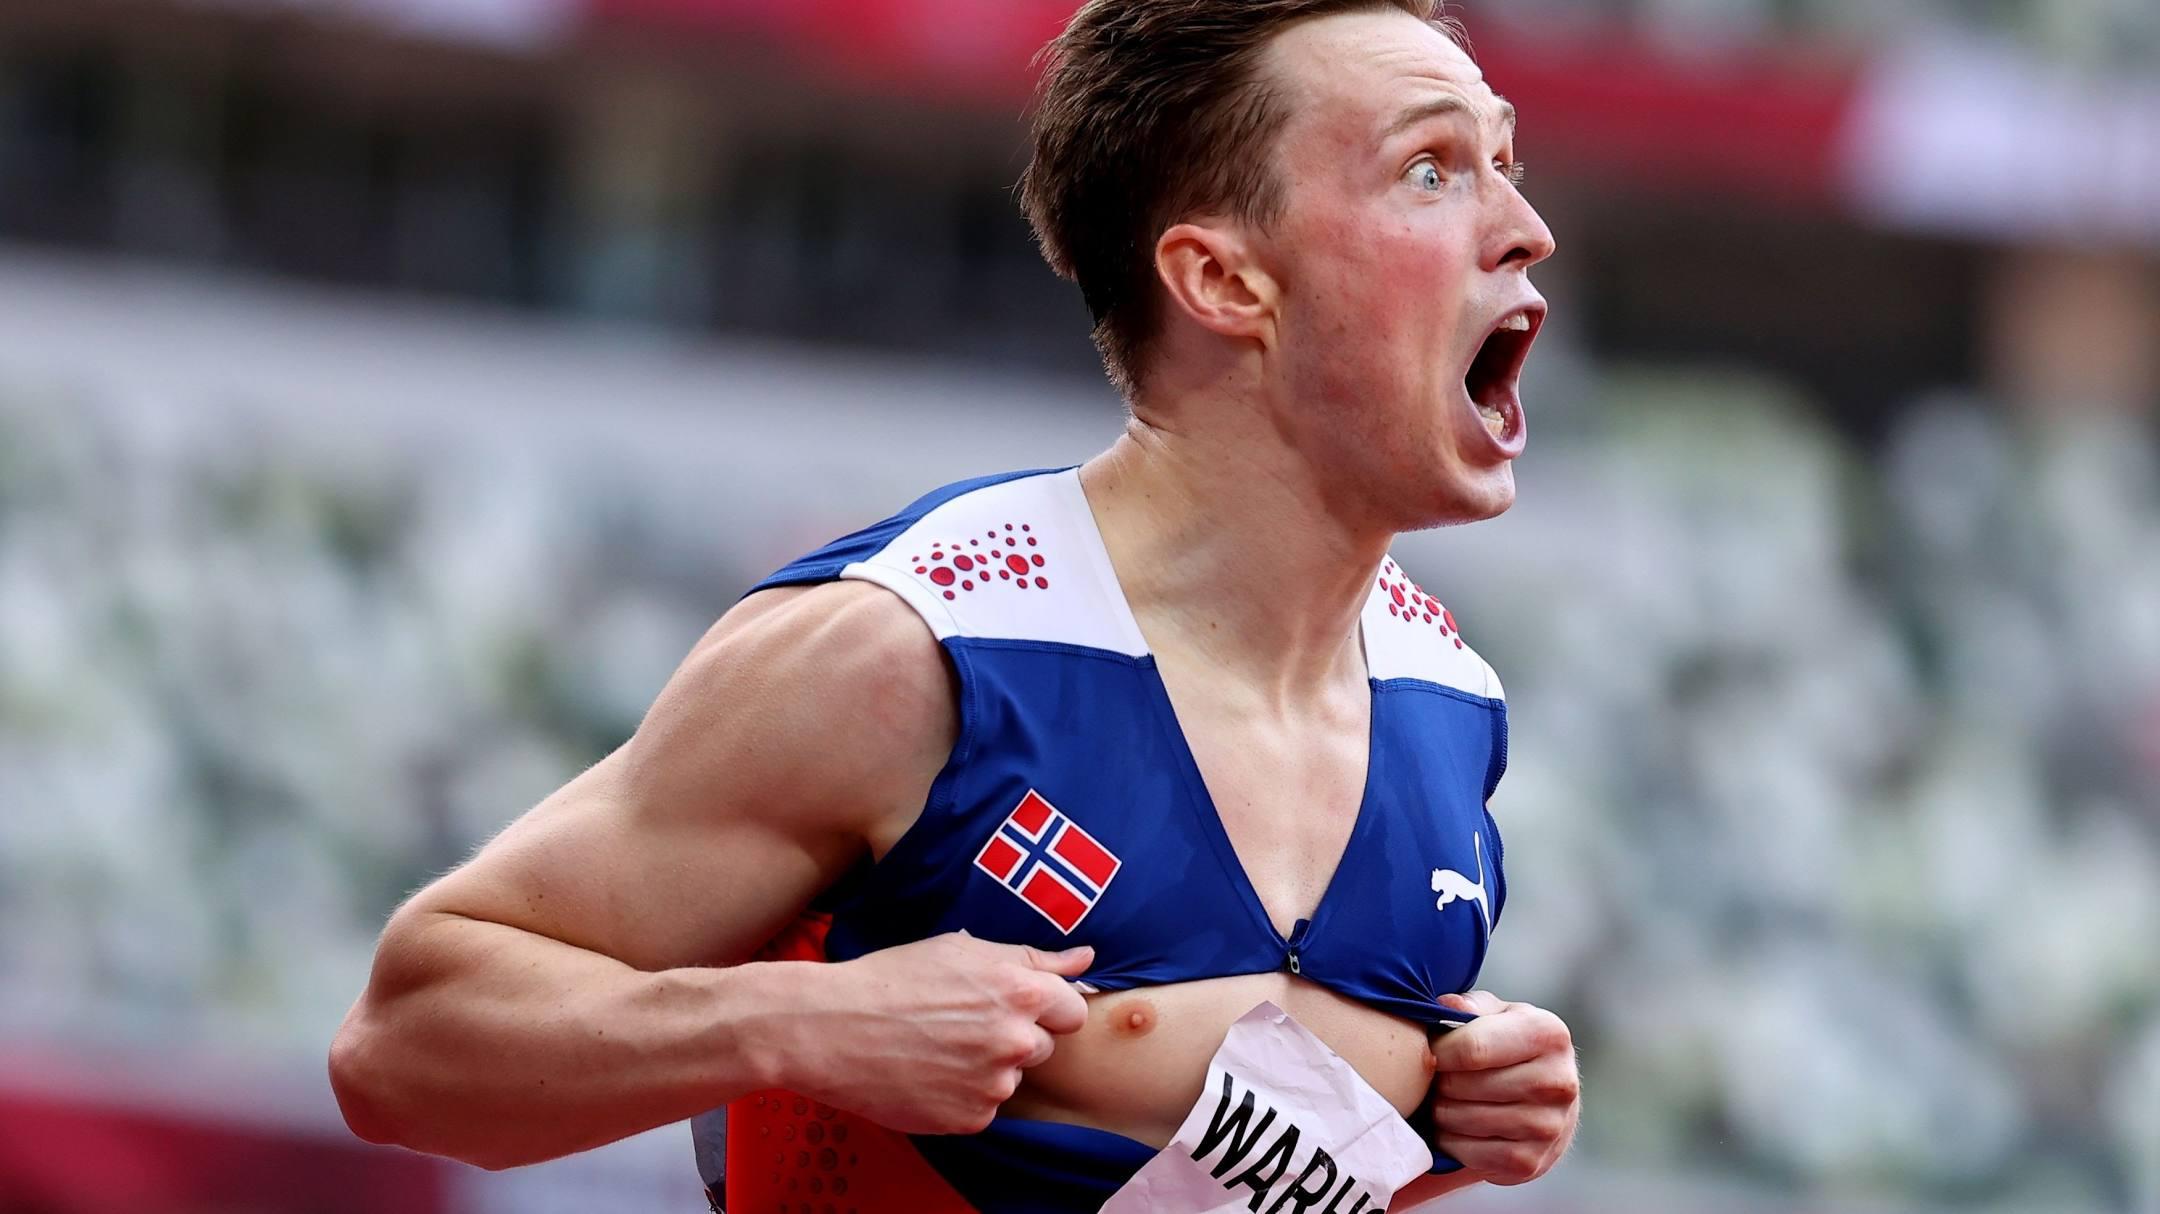 Norwegian athlete breaks 400m hurdles world record